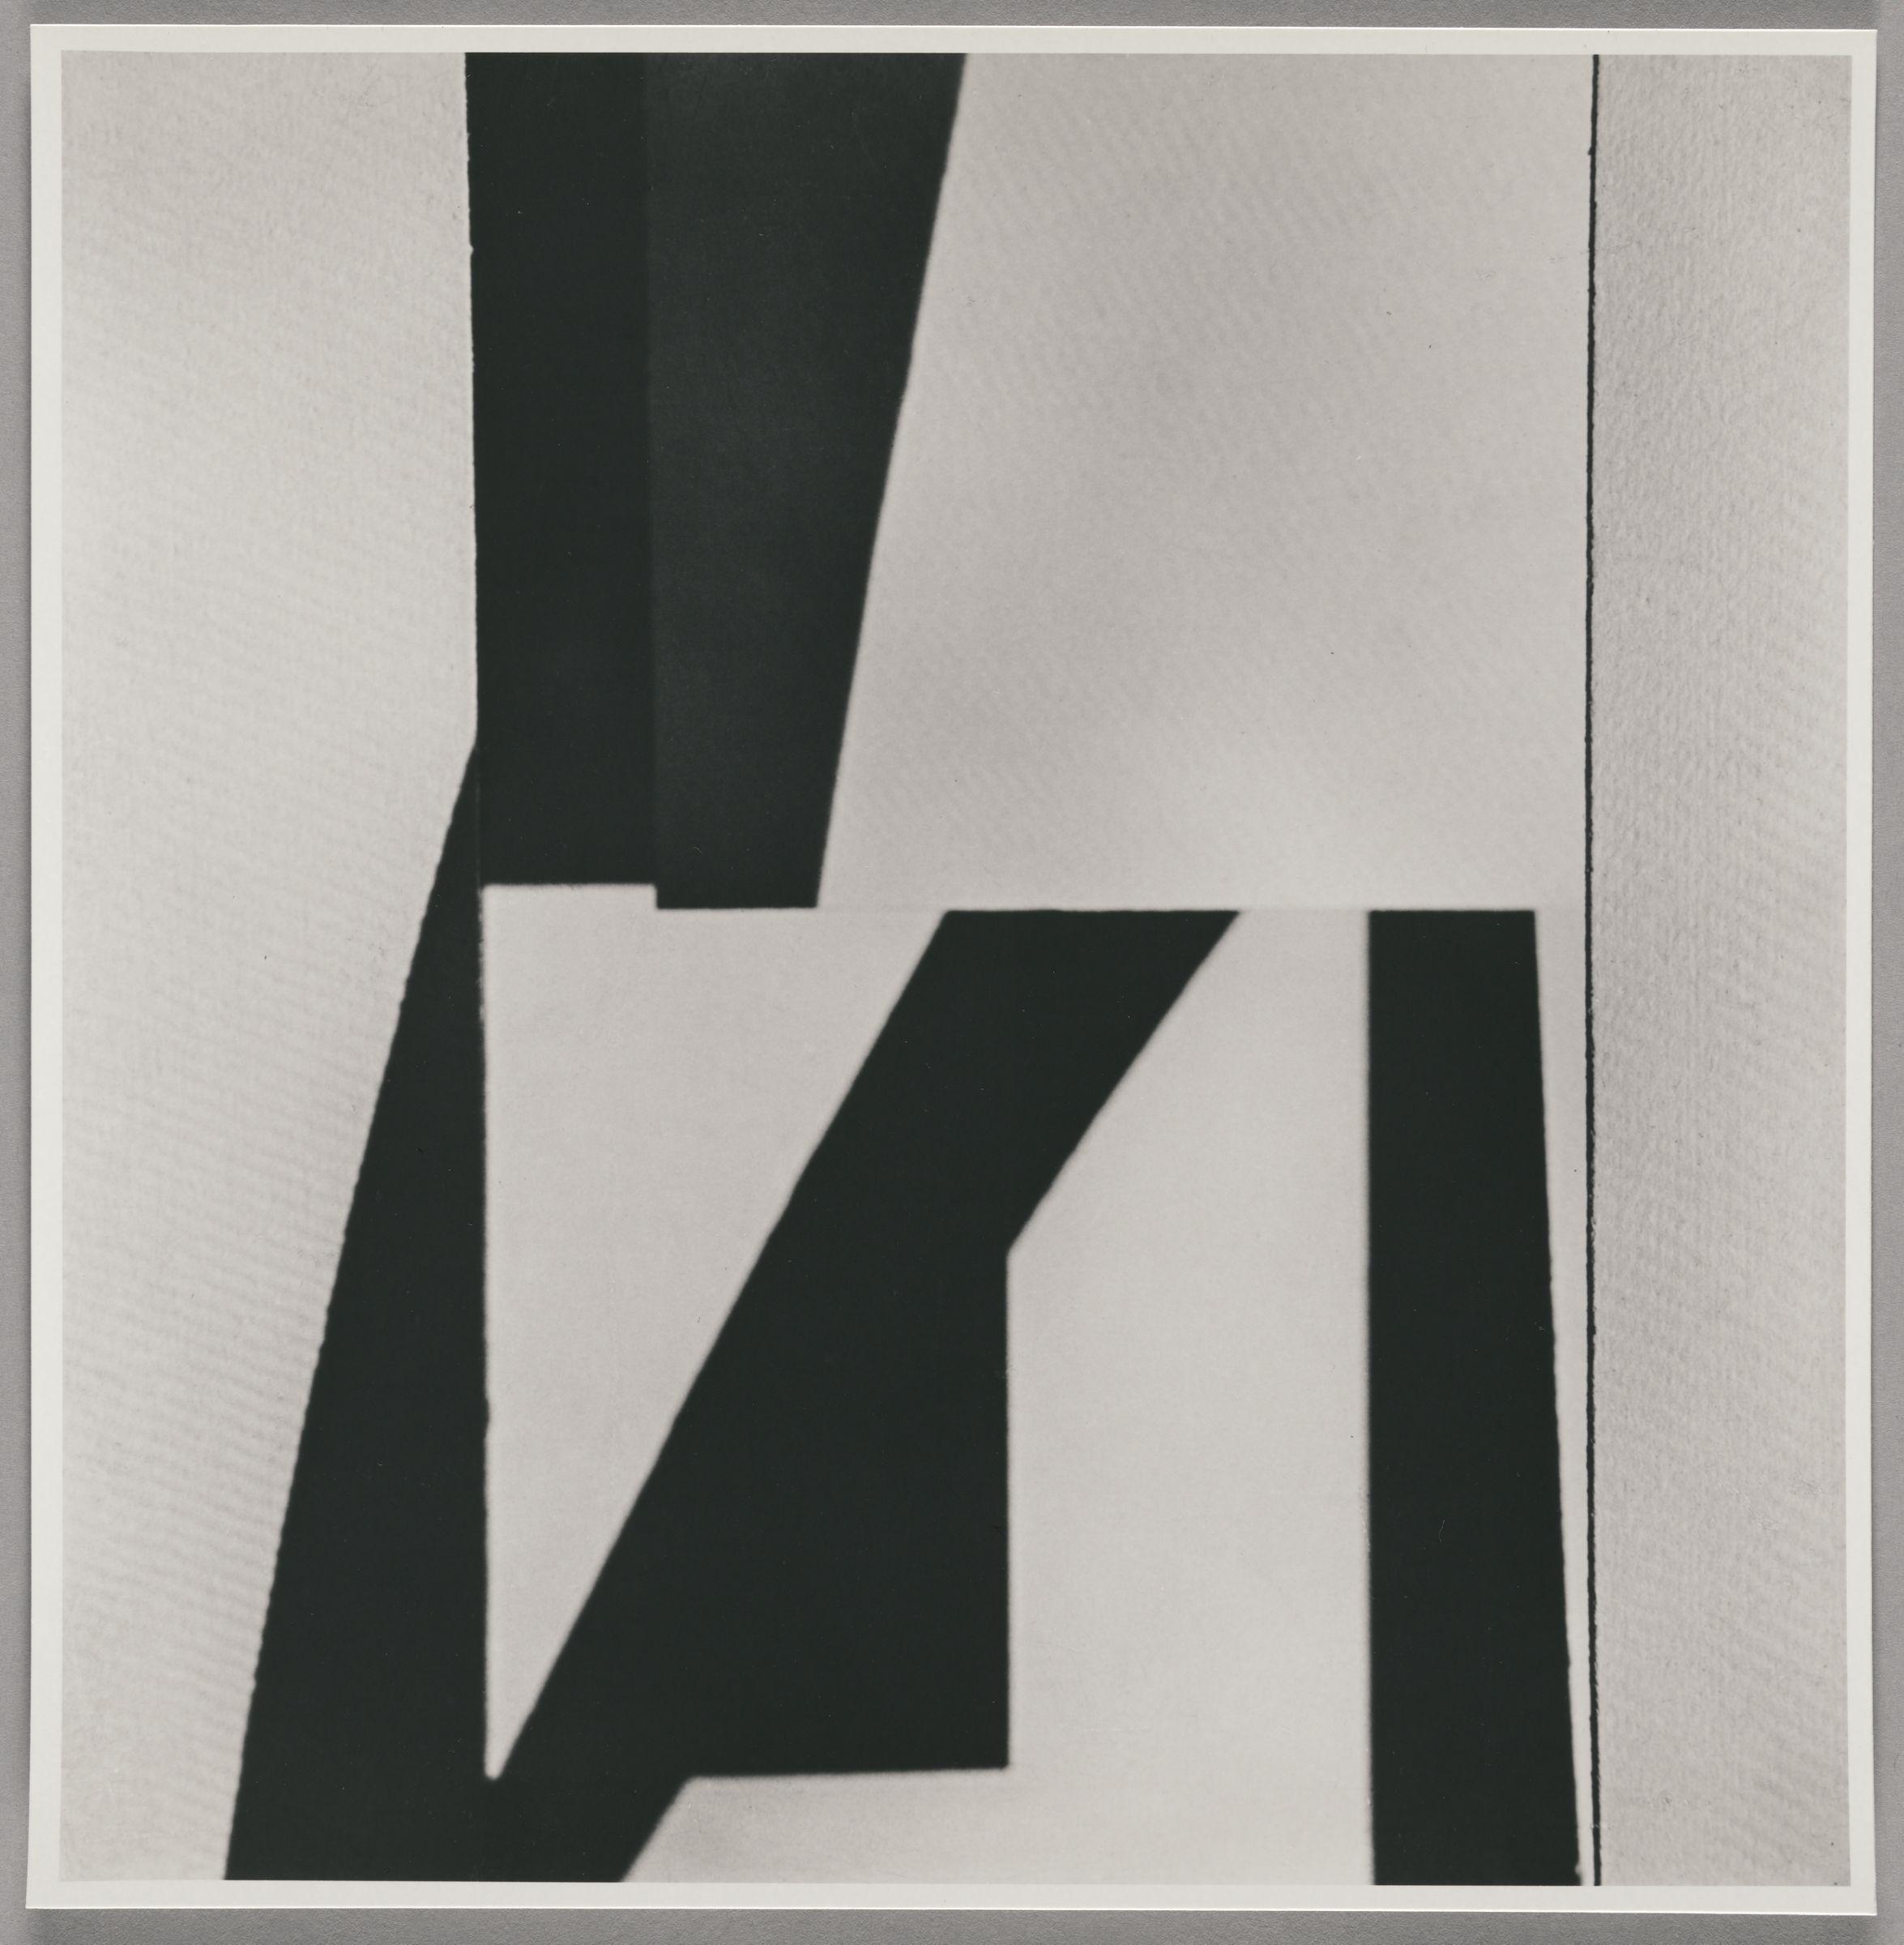 Jaroslav Rössler, Czech, Abstraction, c. 1923, printed 1994. Gelatin silver print. Harvard Art Museums/Fogg Museum, Schneider/Erdman Printer's Proof Collection, partial gift, and partial purchase through the Margaret Fisher Fund, 2011.453.3.